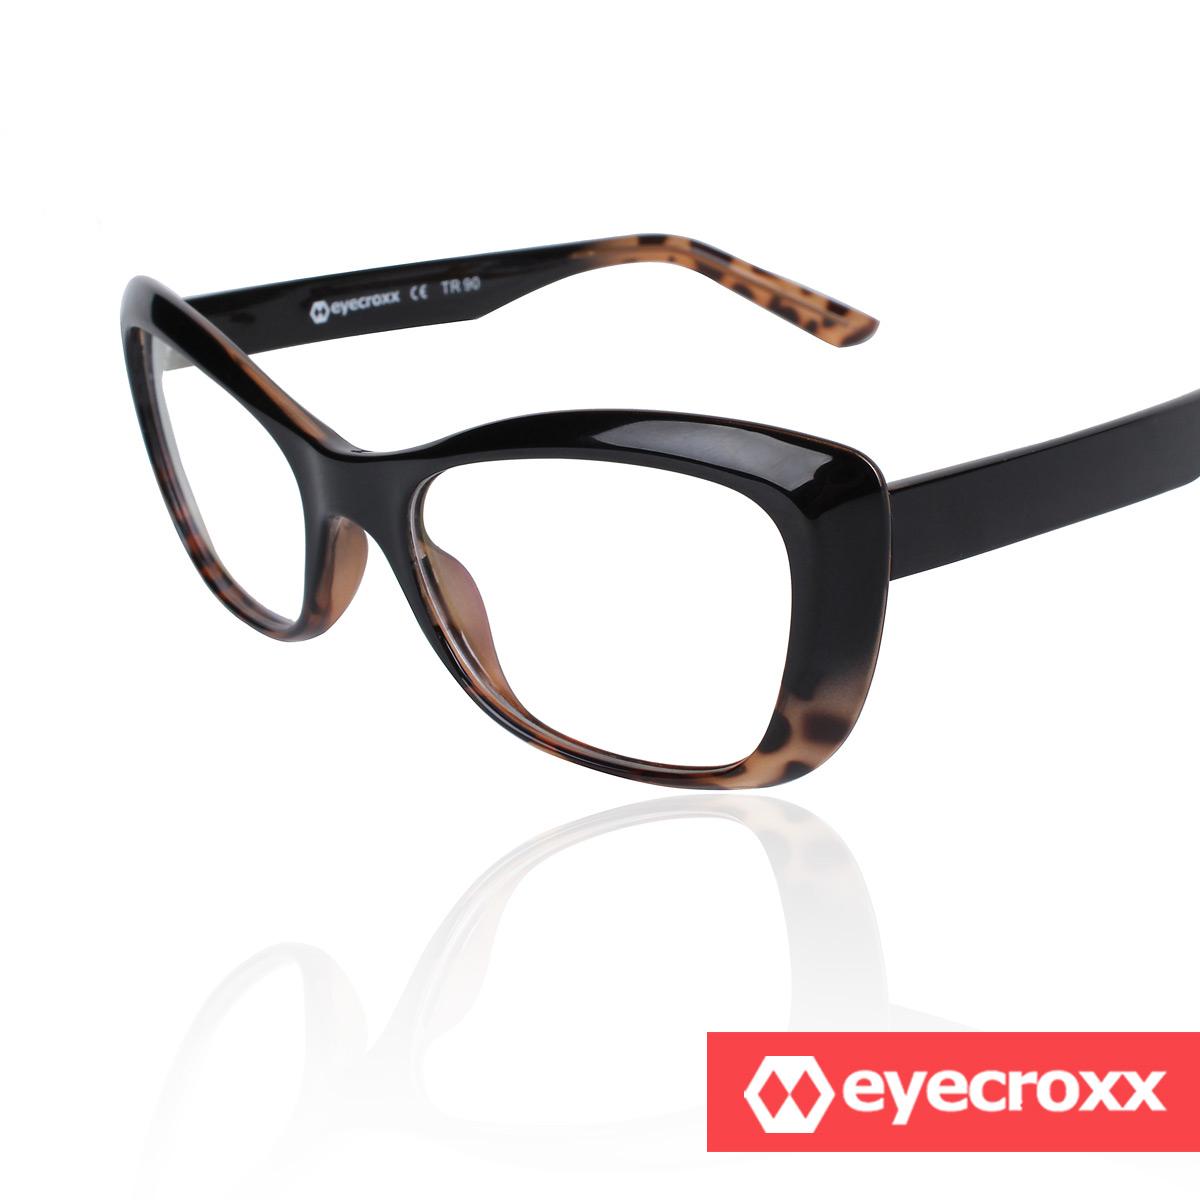 Glasses Frame Decoration : Eyecroxx-glasses-box-female-ultra-light-tr90-radiation ...